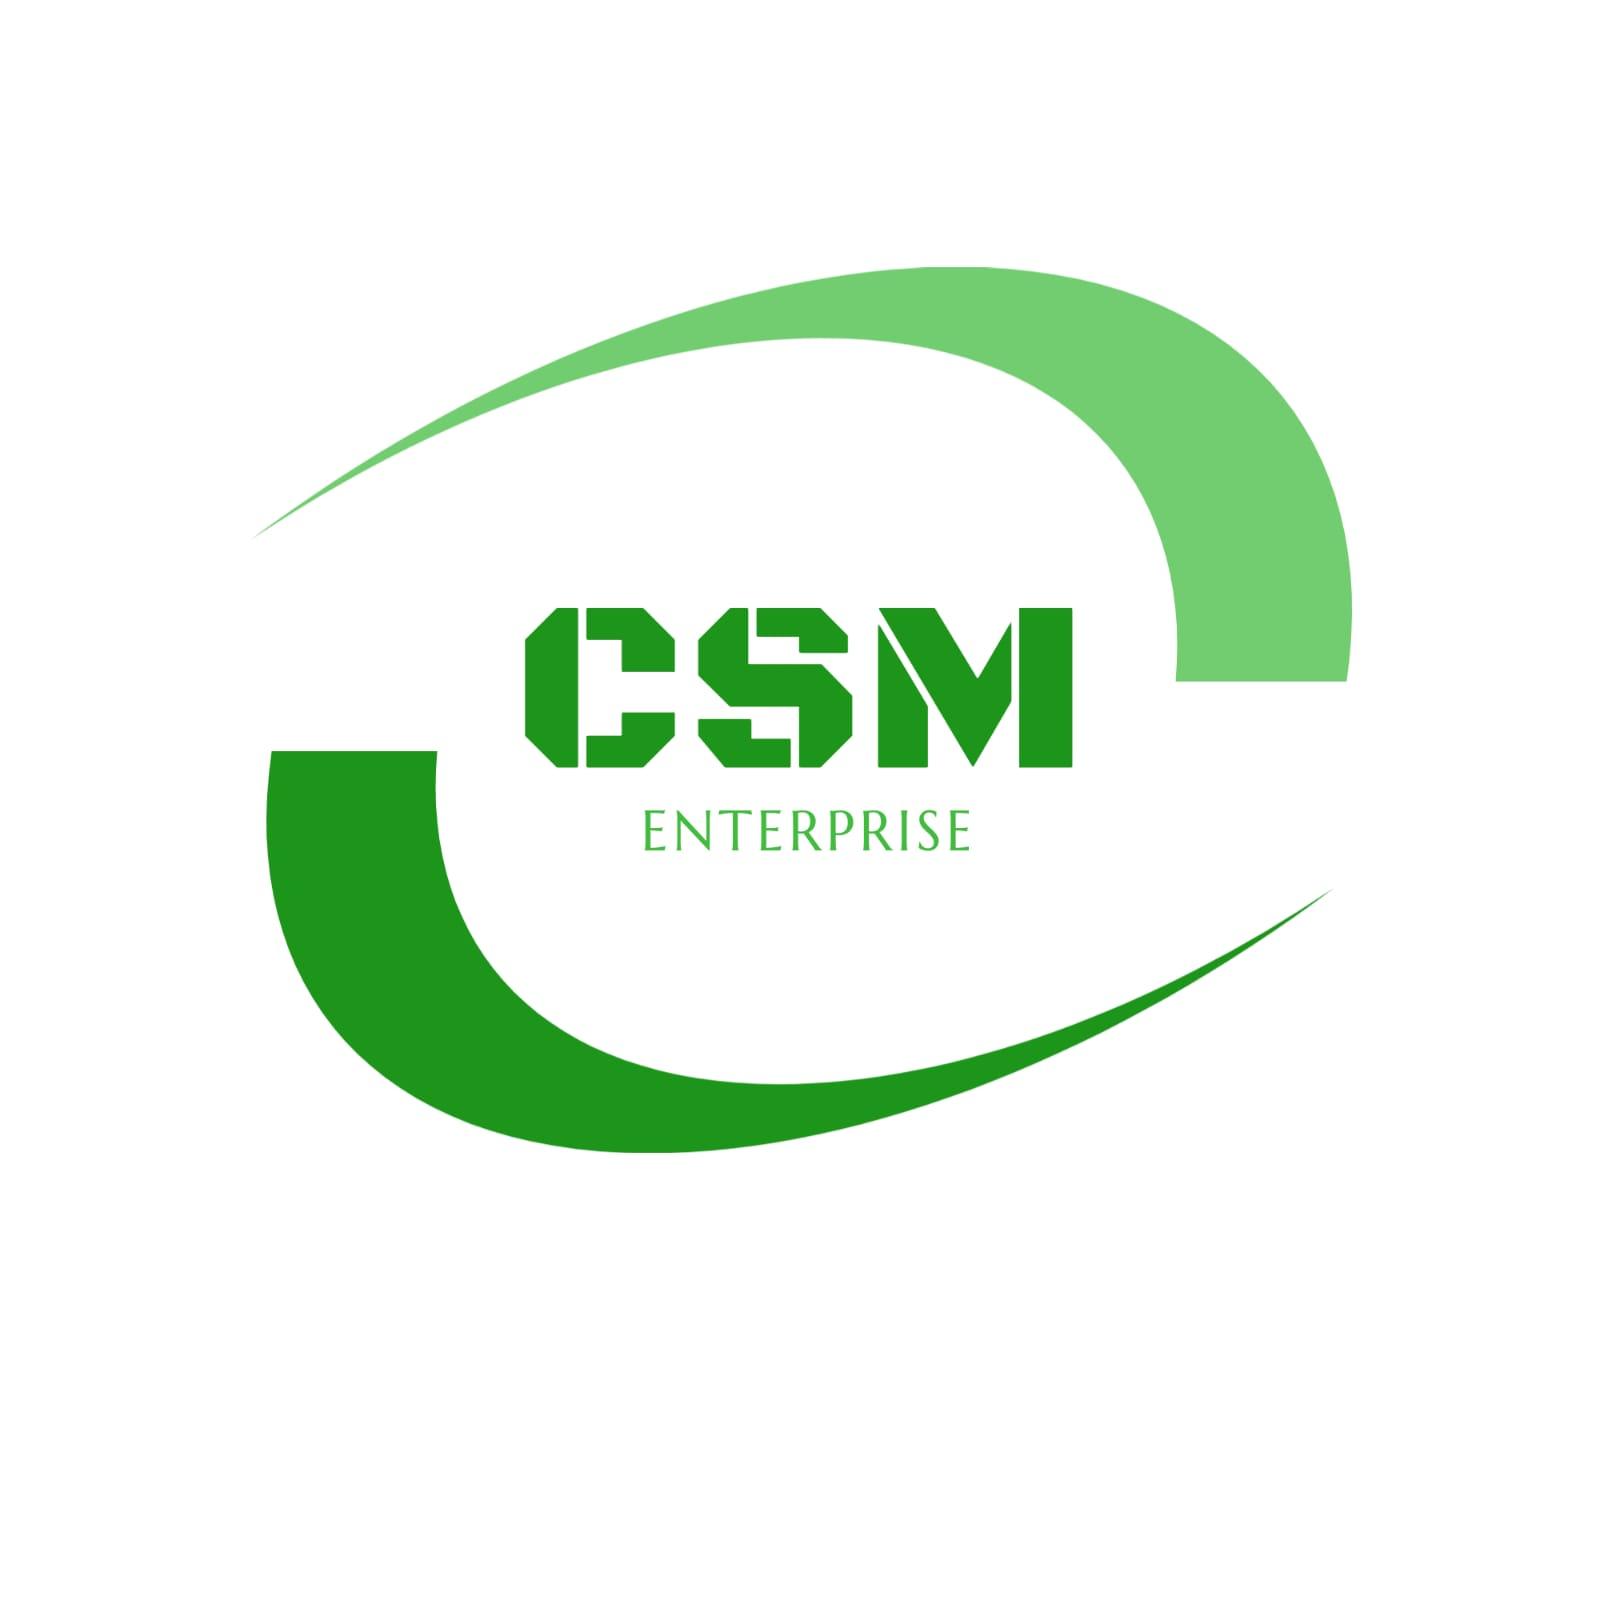 Csm Enterprise